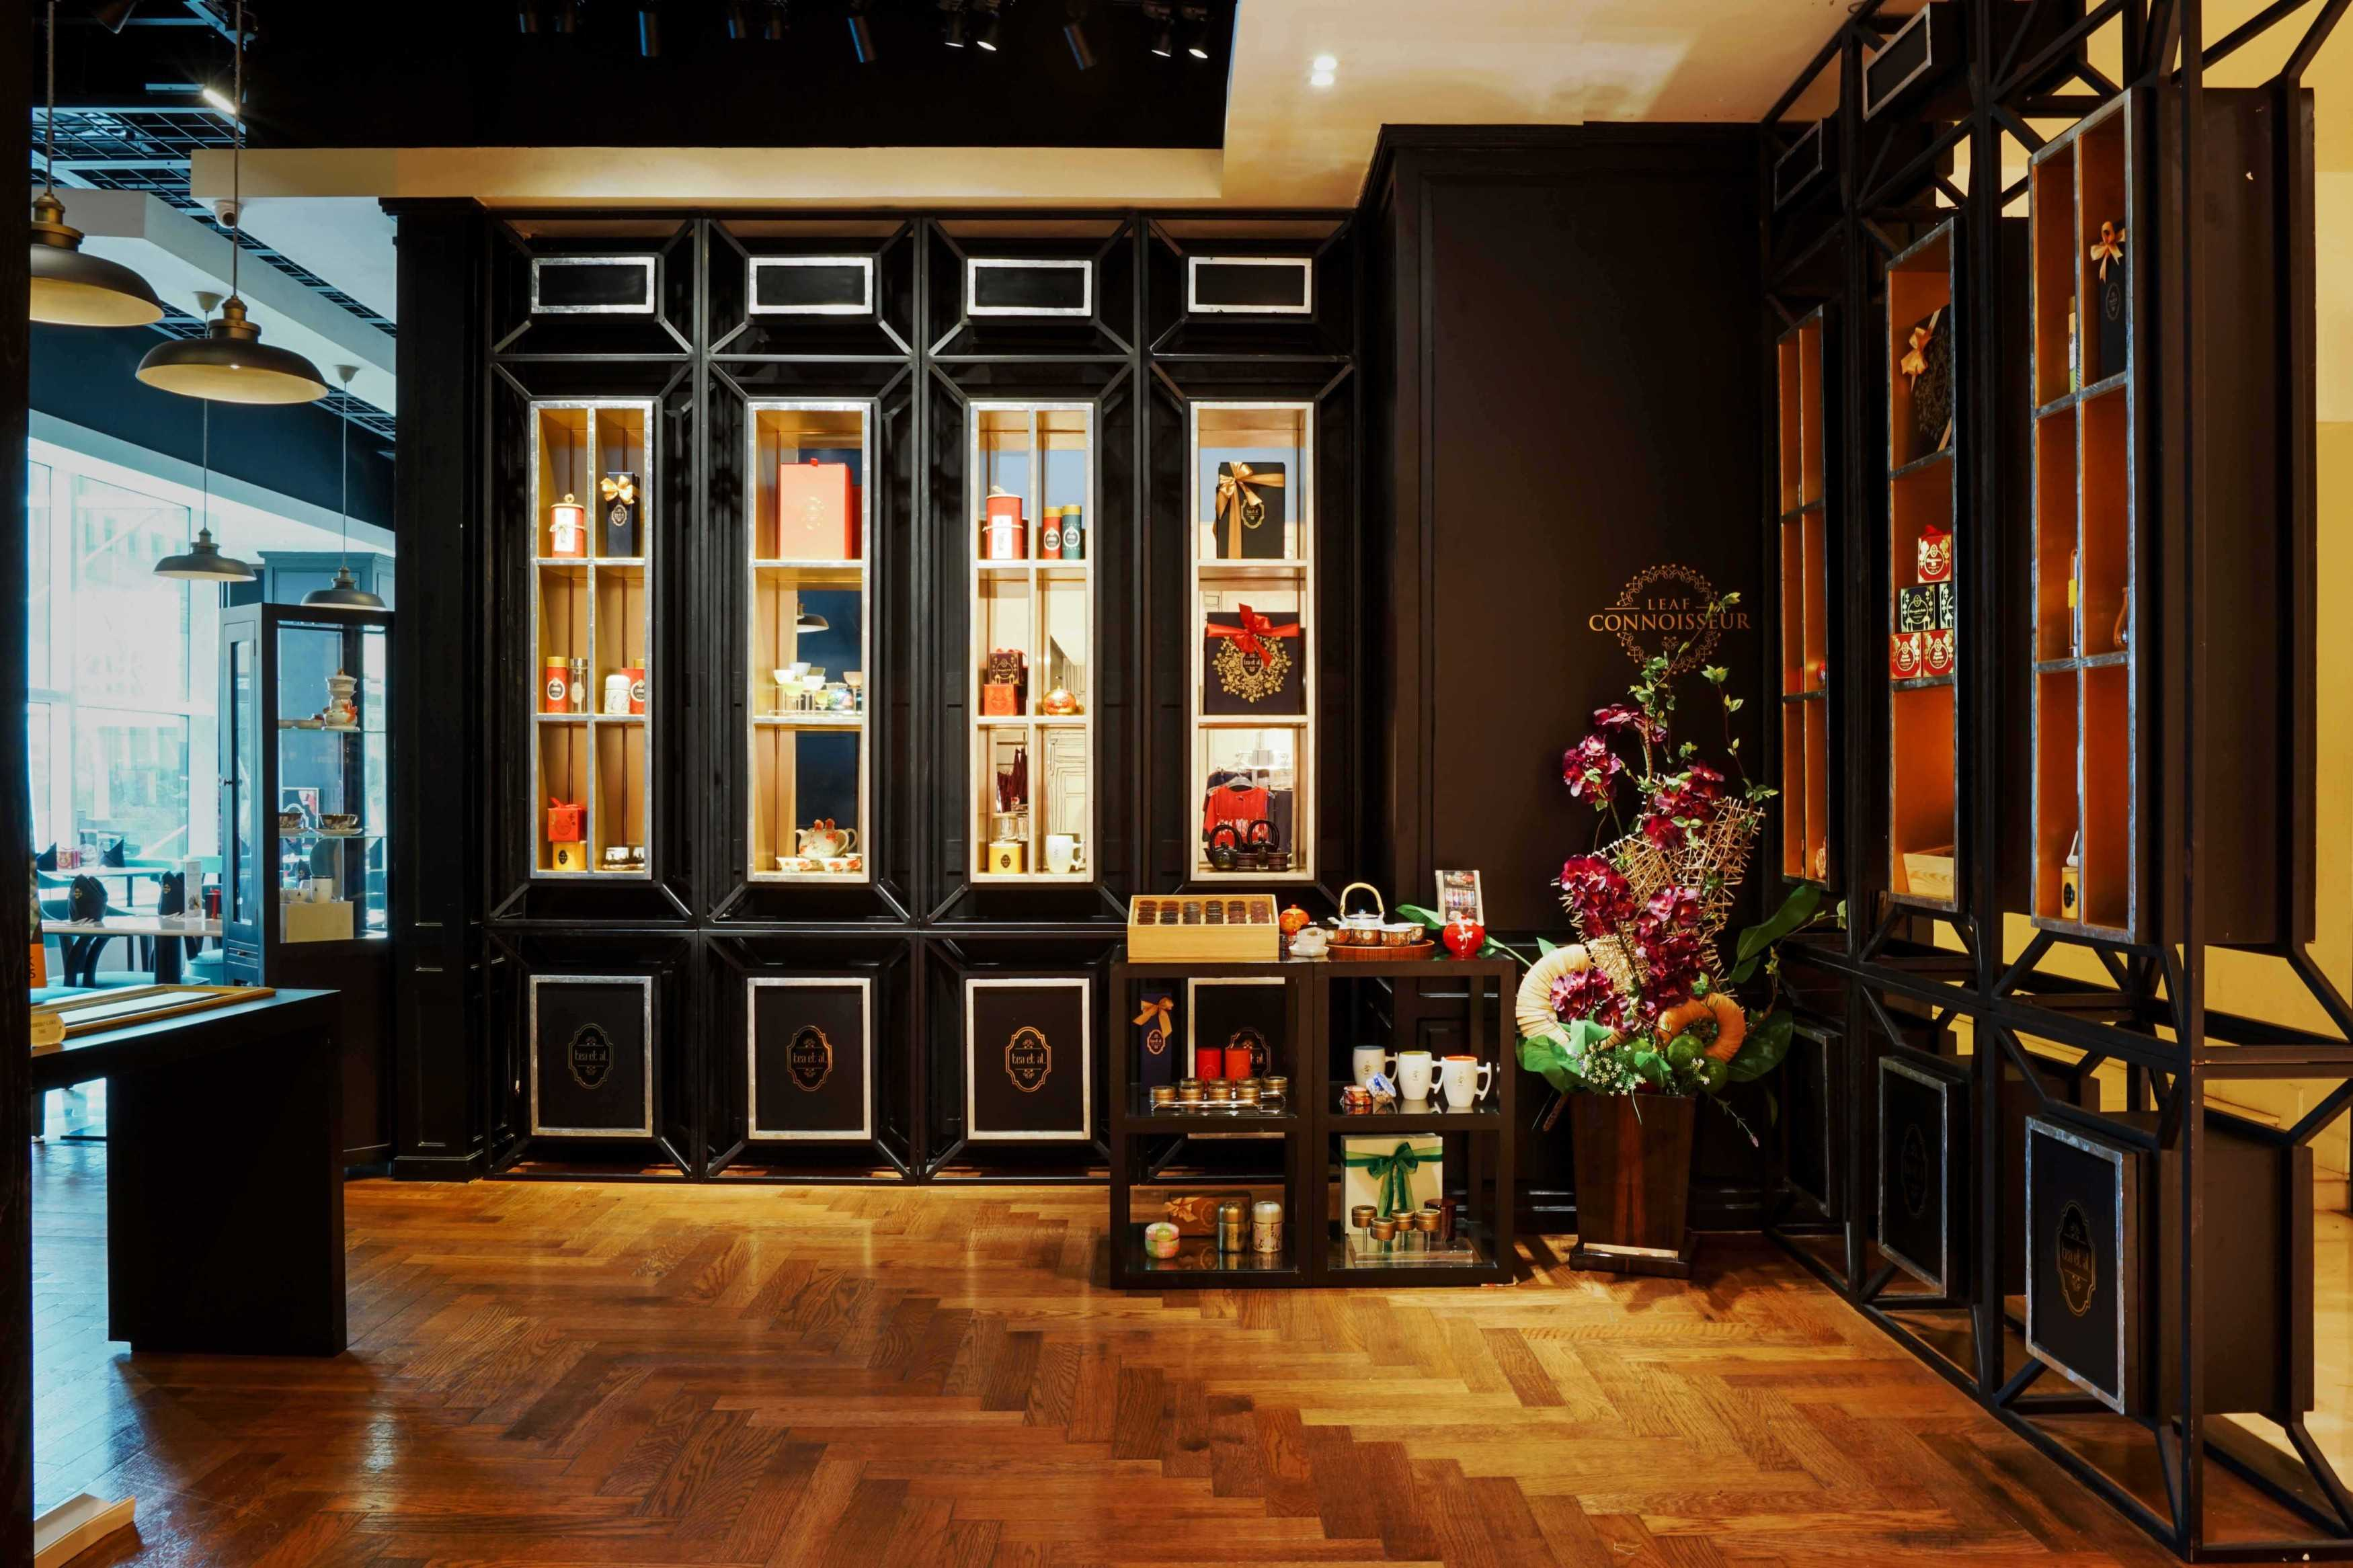 Aurasia Design  Tea At All-Pacific Place Jakarta Selatan, Kota Jakarta Selatan, Daerah Khusus Ibukota Jakarta, Indonesia Jakarta Selatan, Kota Jakarta Selatan, Daerah Khusus Ibukota Jakarta, Indonesia Aurasia-Design-Tea-At-All-Pacific-Place   59321